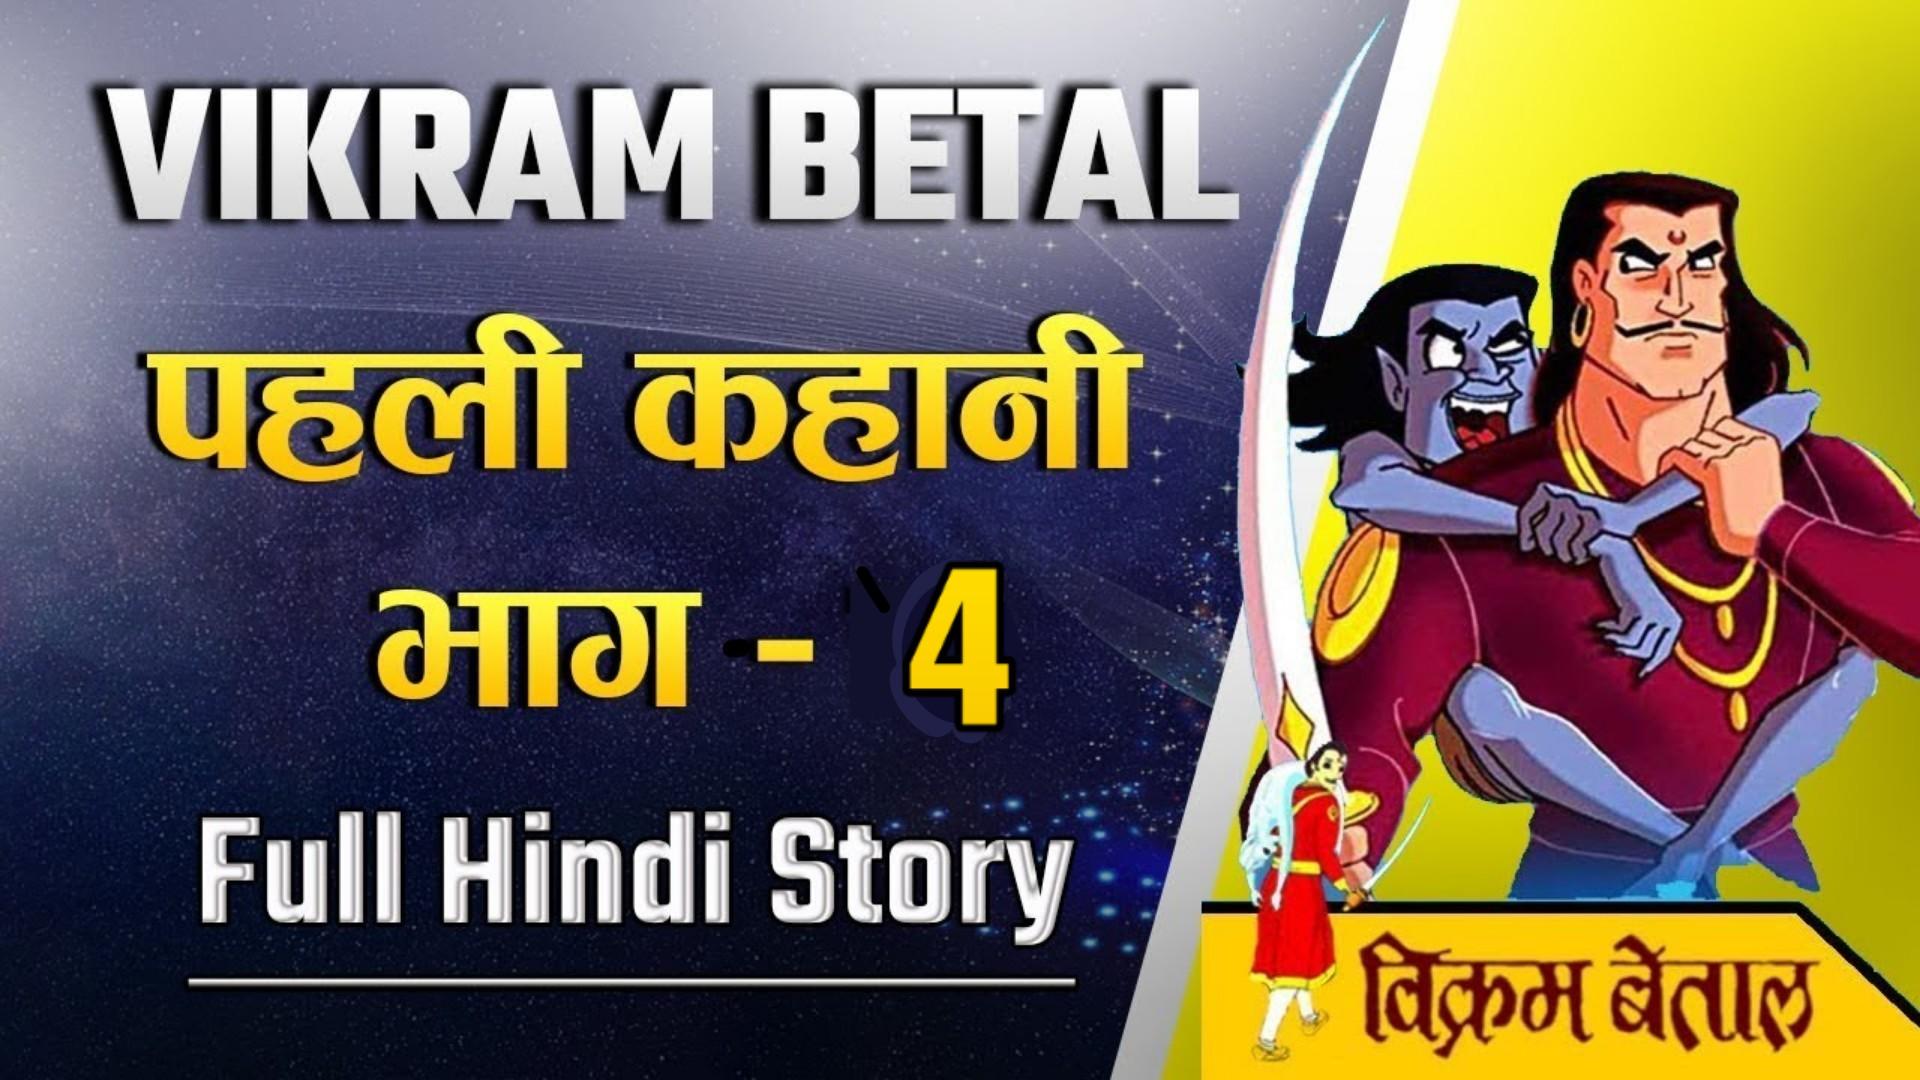 Vikram Vetal Hindi Story